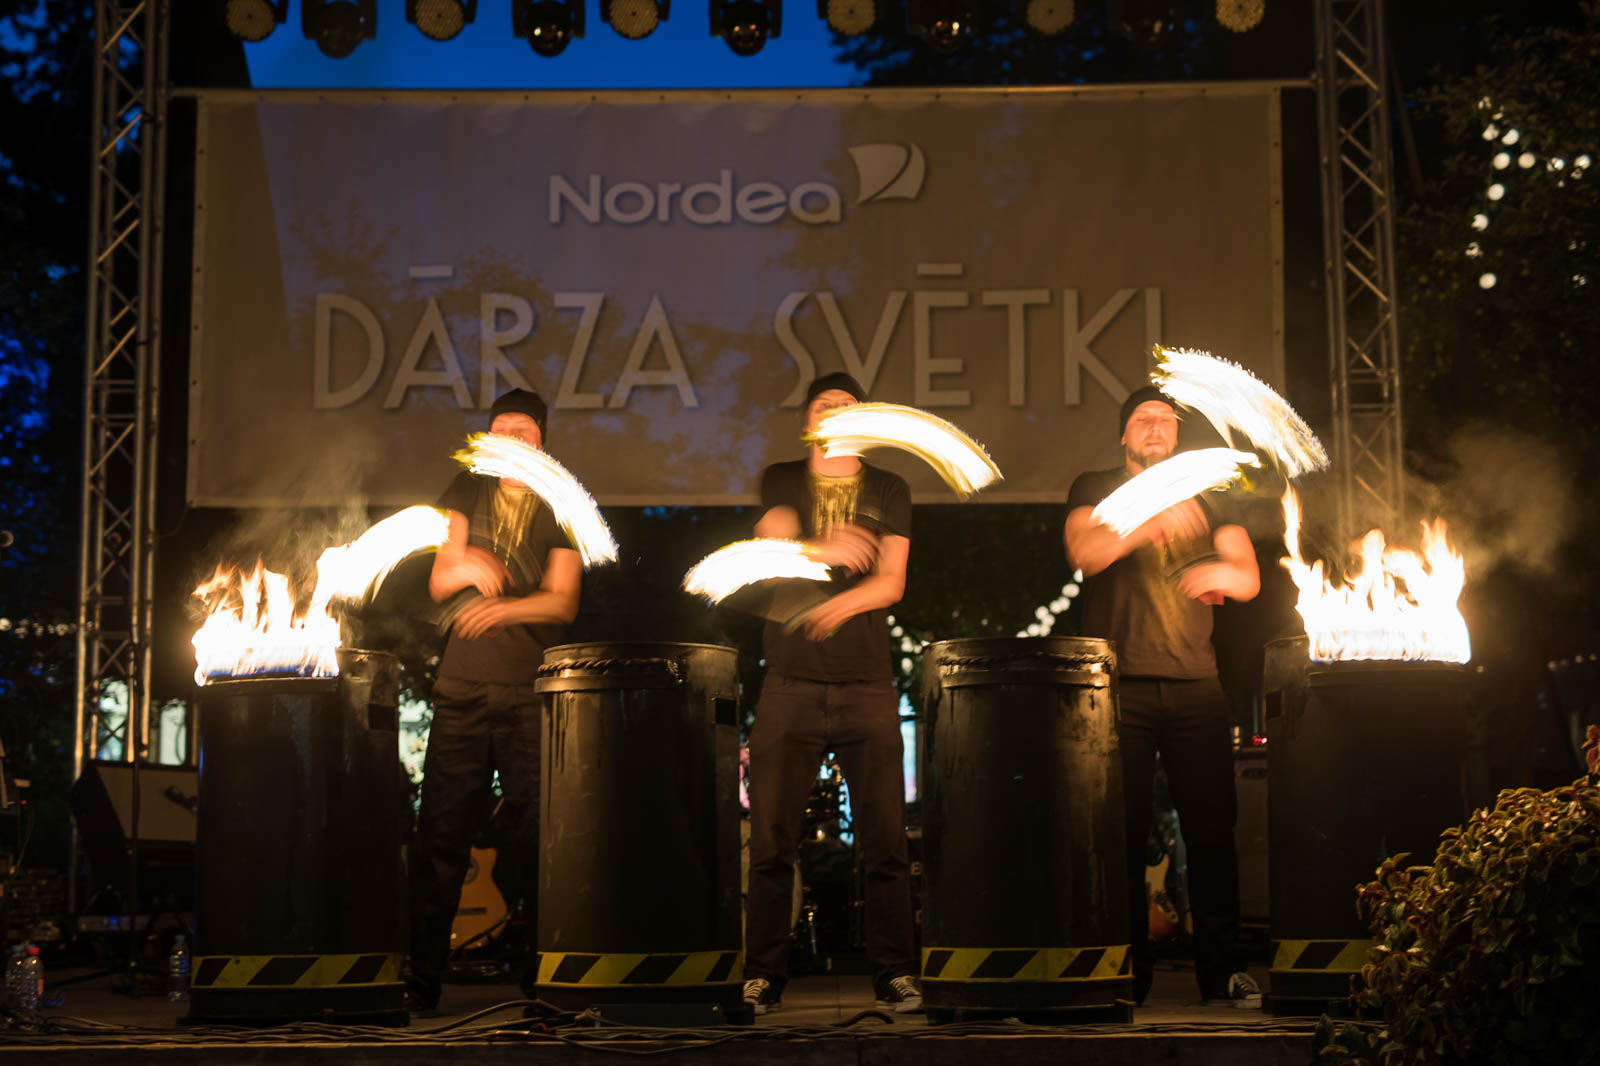 Nordea_DarzaSvetki_s-480